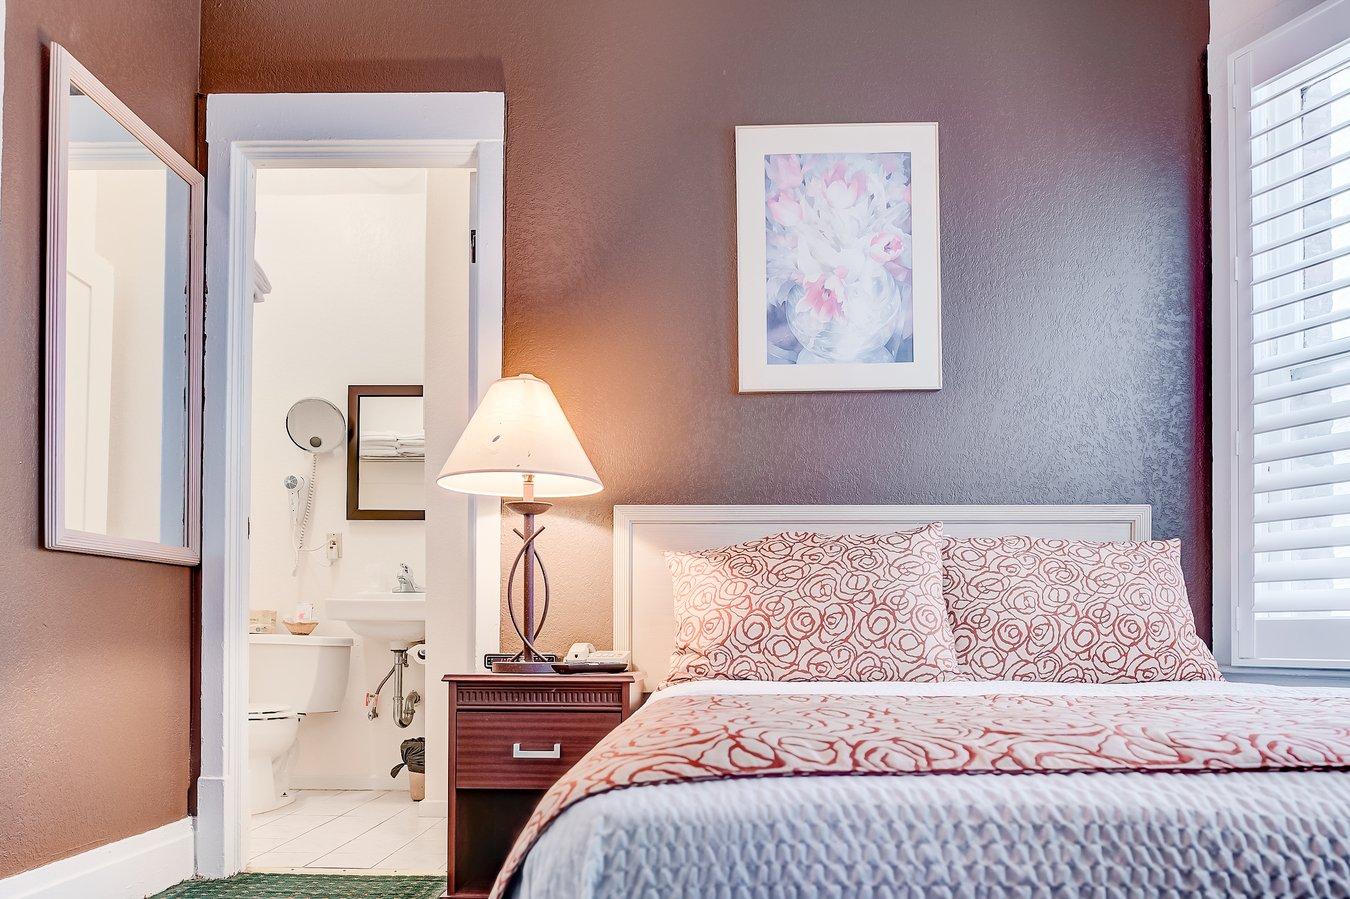 Studio 1 Bathroom Apartment for rent at Mithila Residences in San Francisco, CA